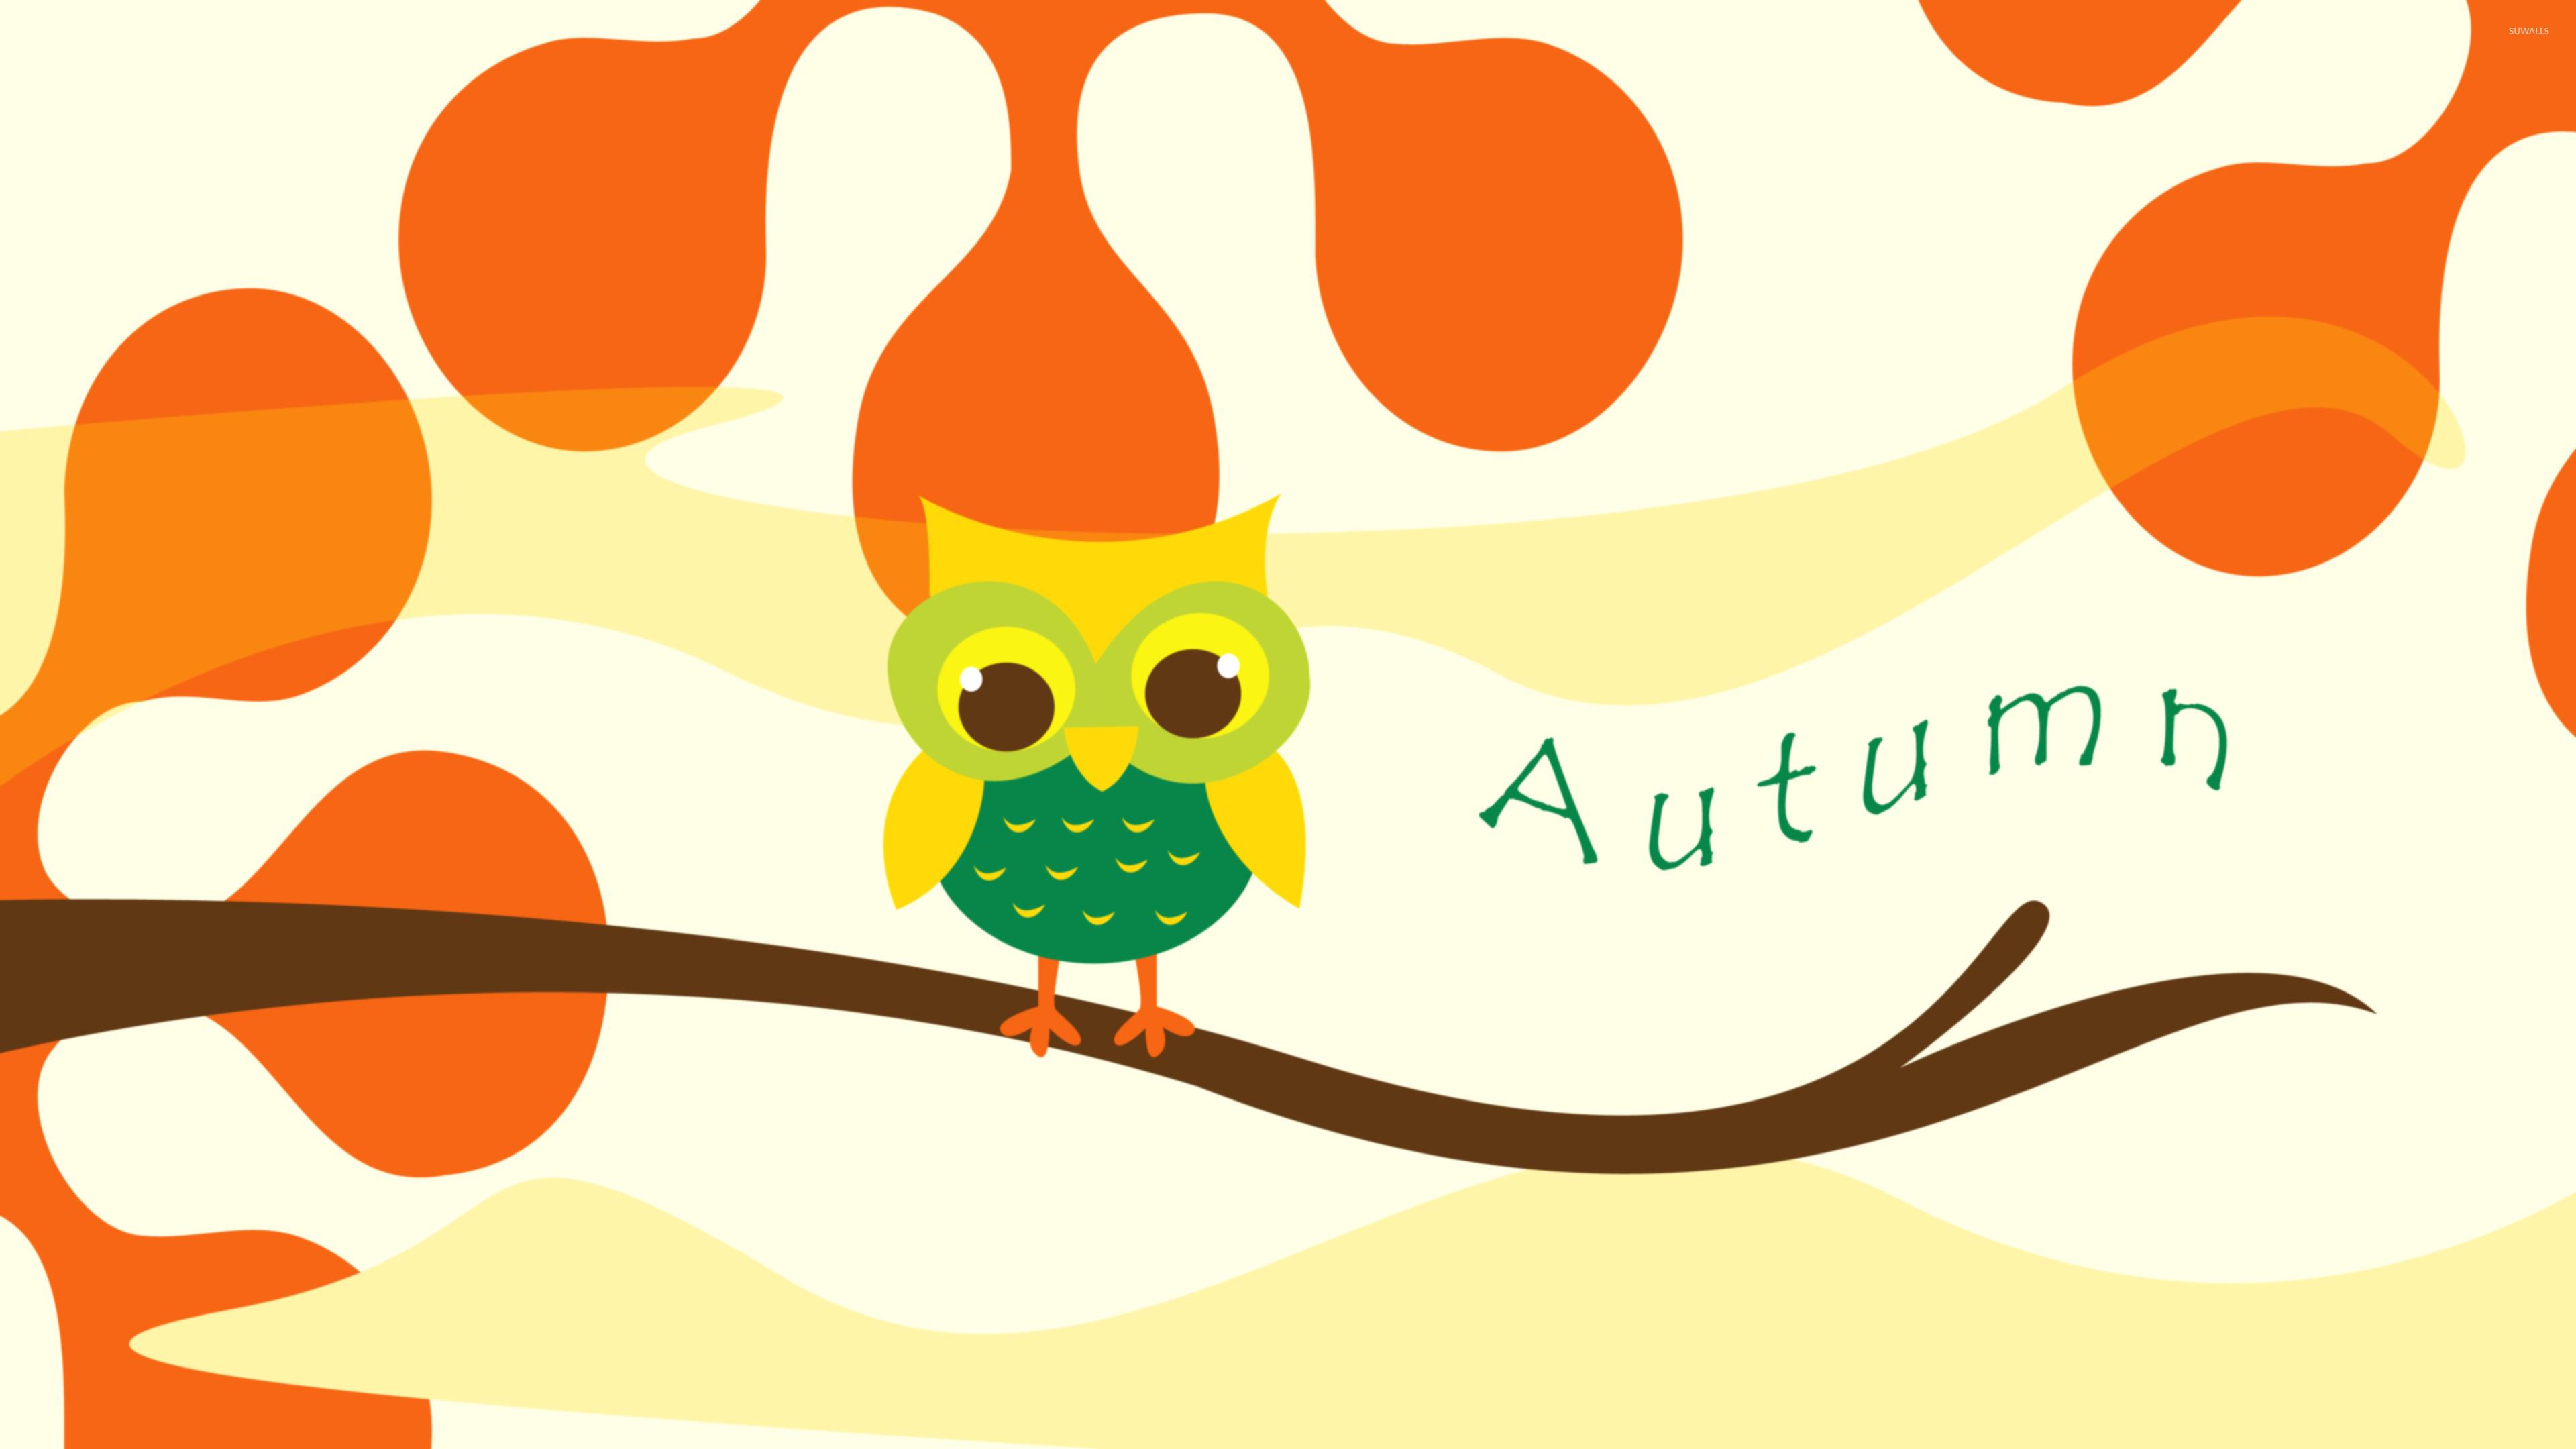 Cute owl wallpapers 65 images 1920x1080 cute owl desktop wallpaper voltagebd Images